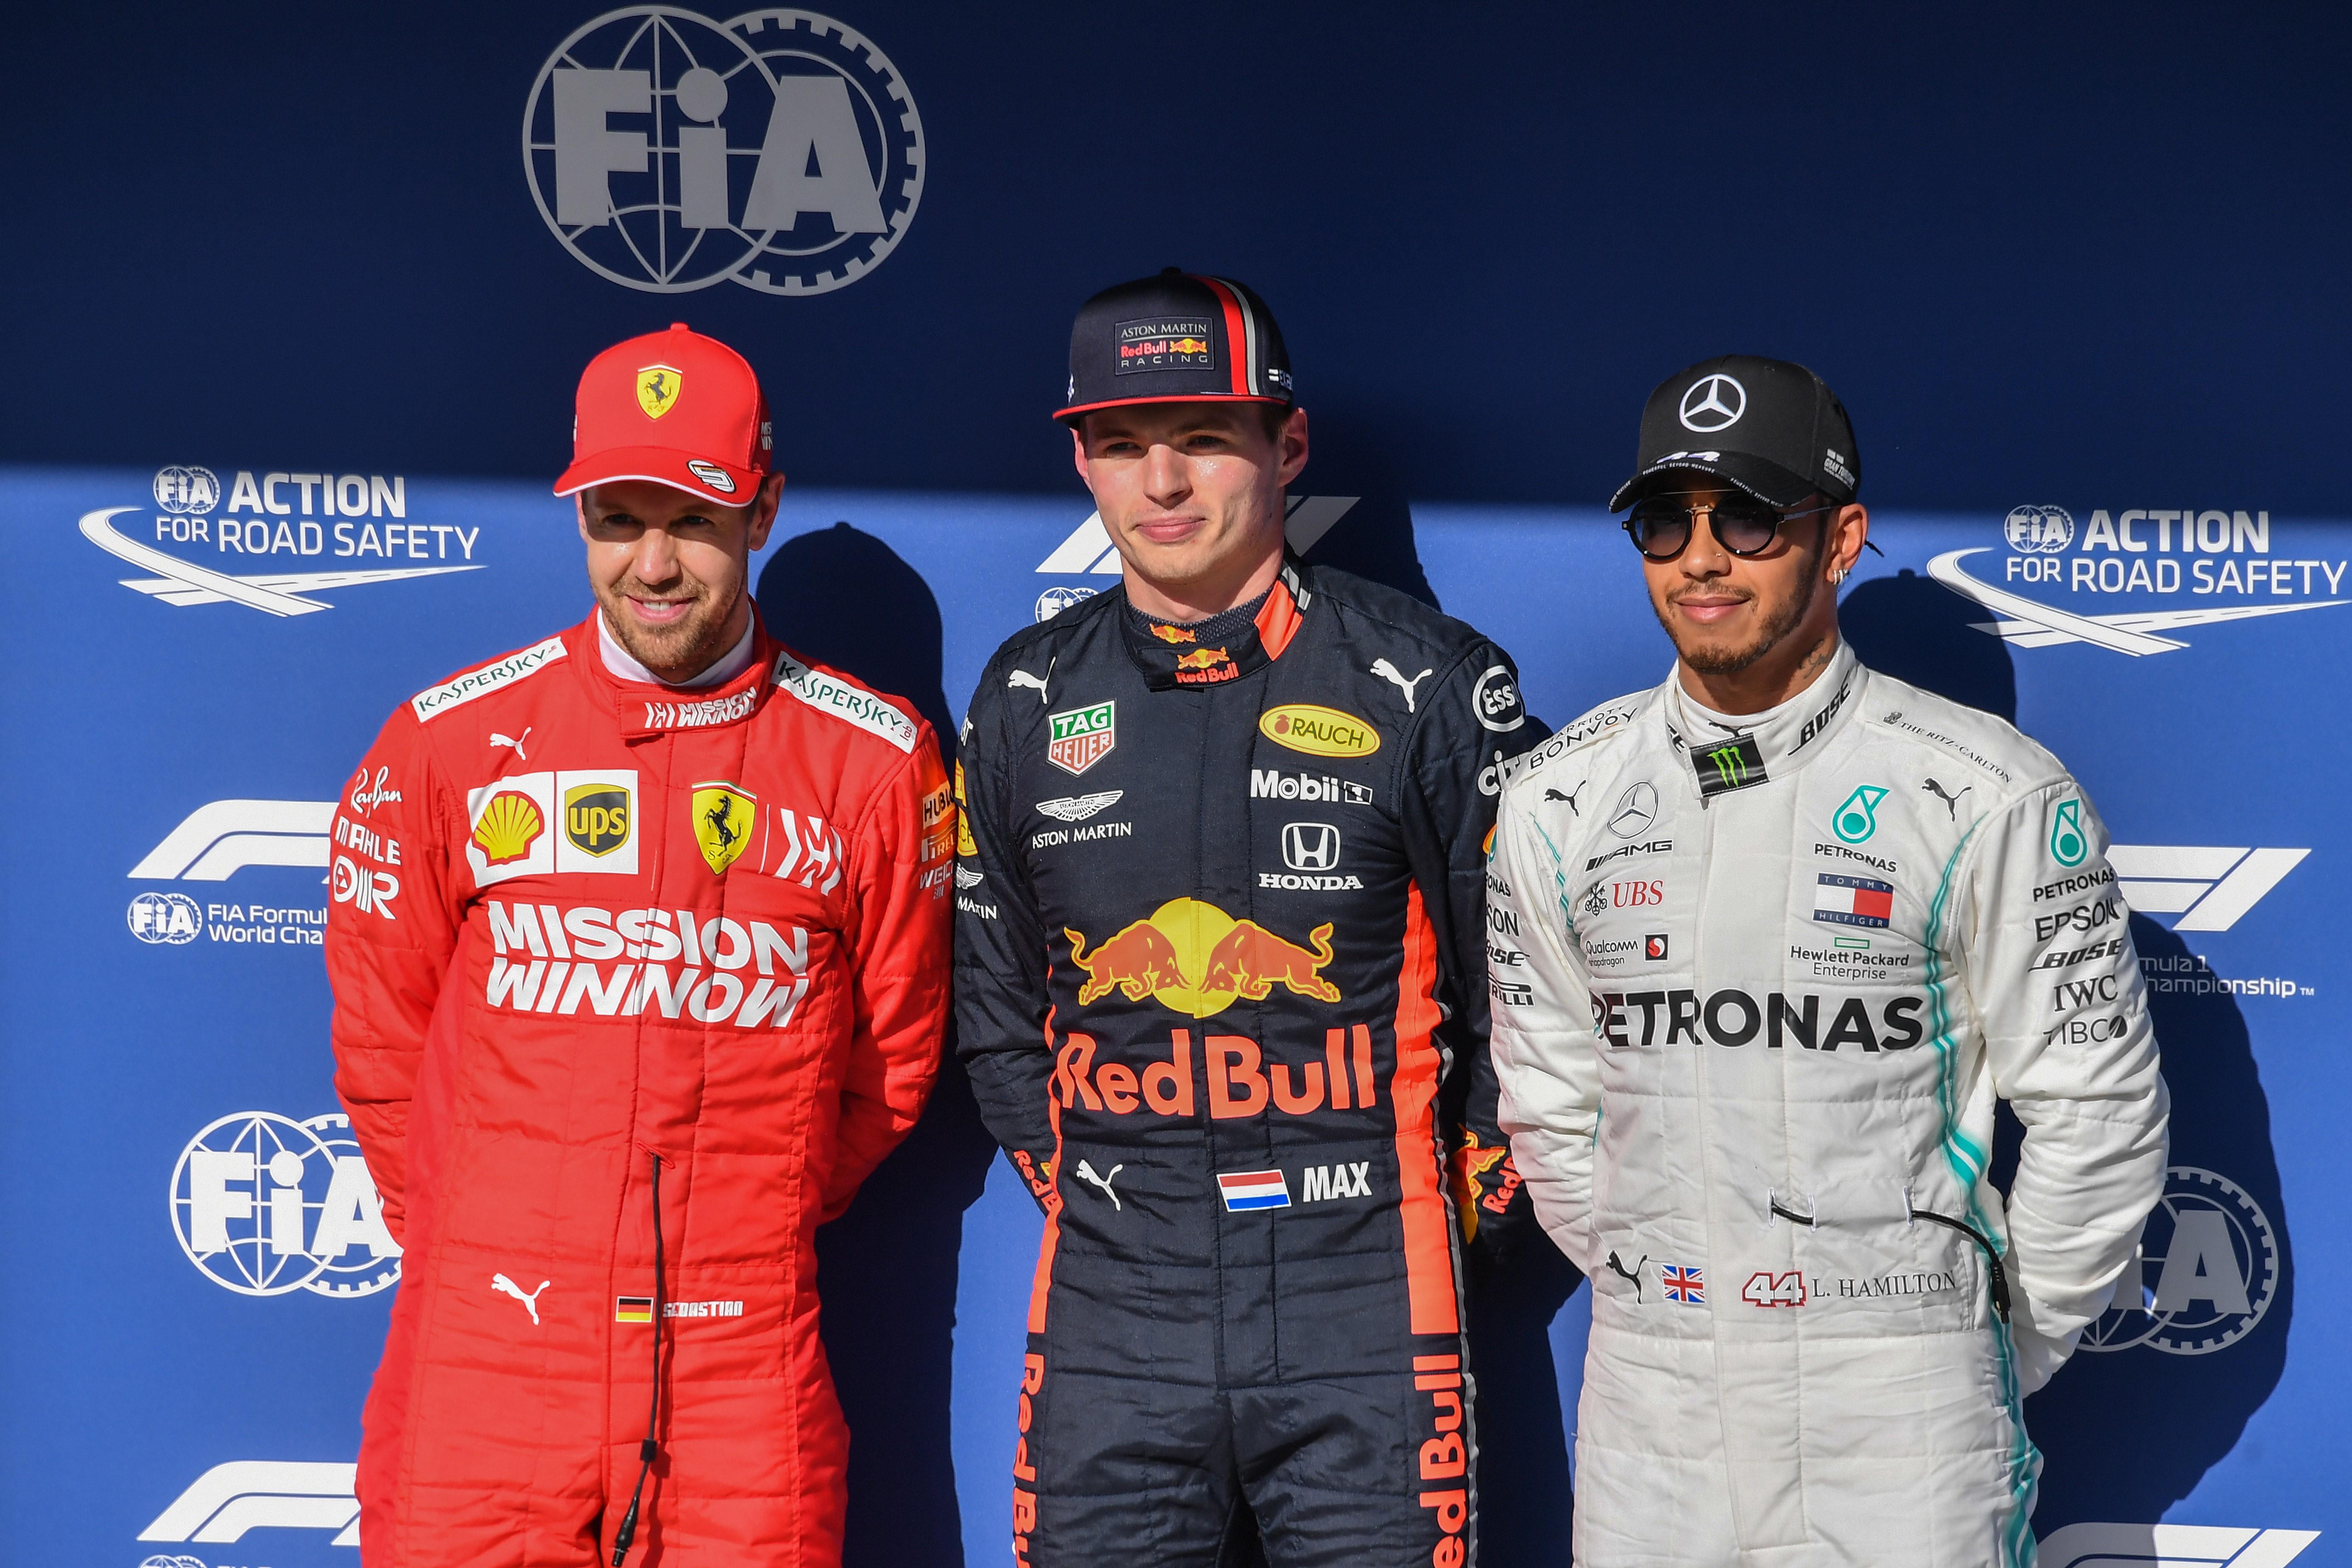 Sebastian Vettel (Ferrari), Max Verstappen (Red Bull) et Lewis Hamilton (Mercedes) au Grand Prix du Brésil 2019